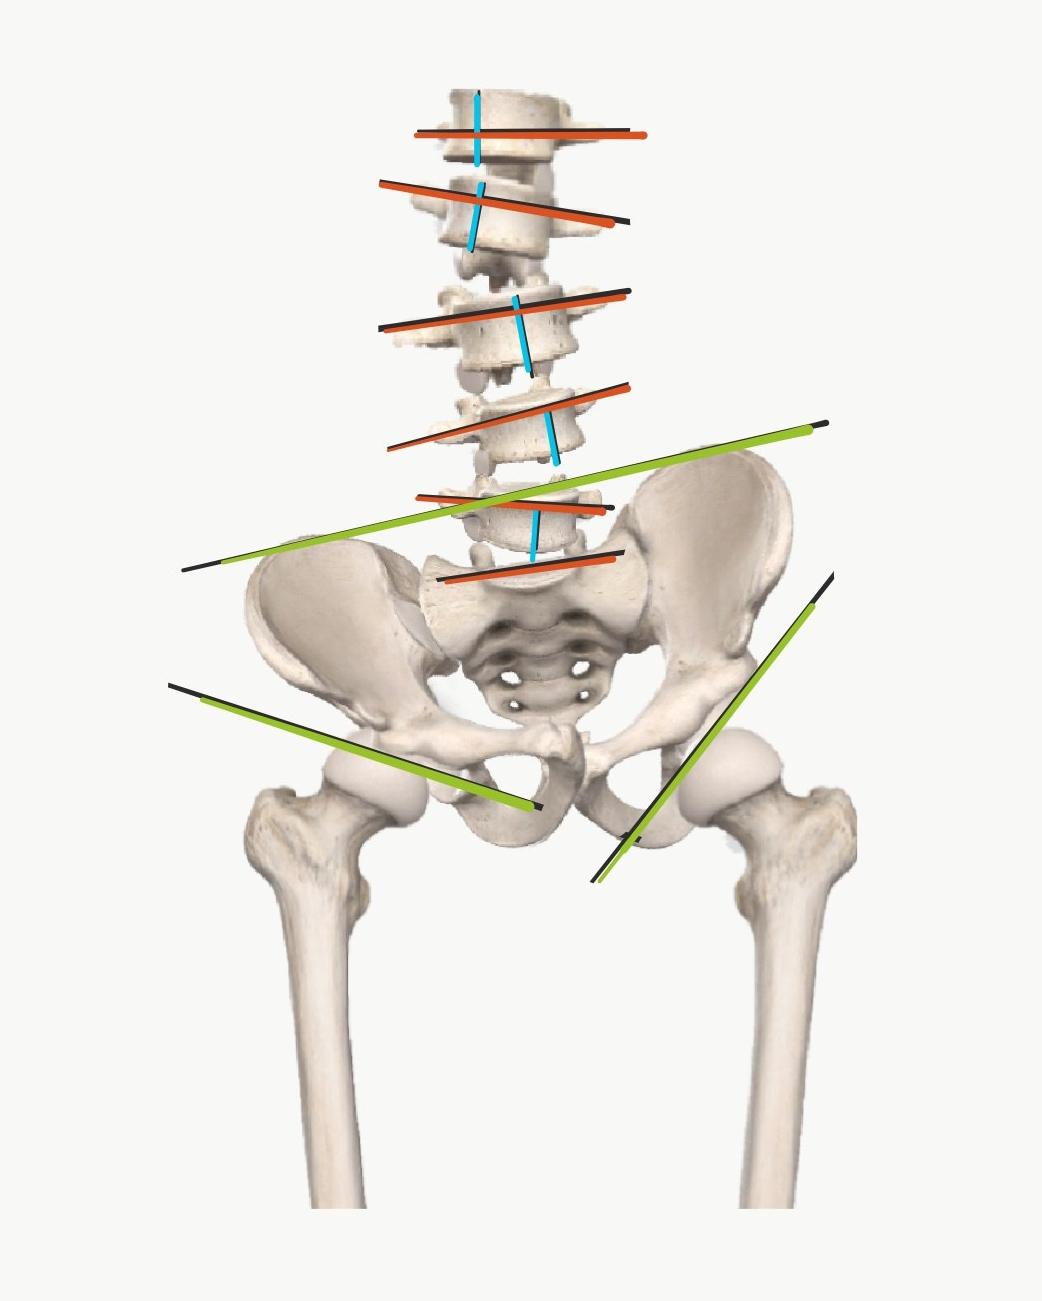 腰部脊柱管狭窄症・多様な病態把握で改善